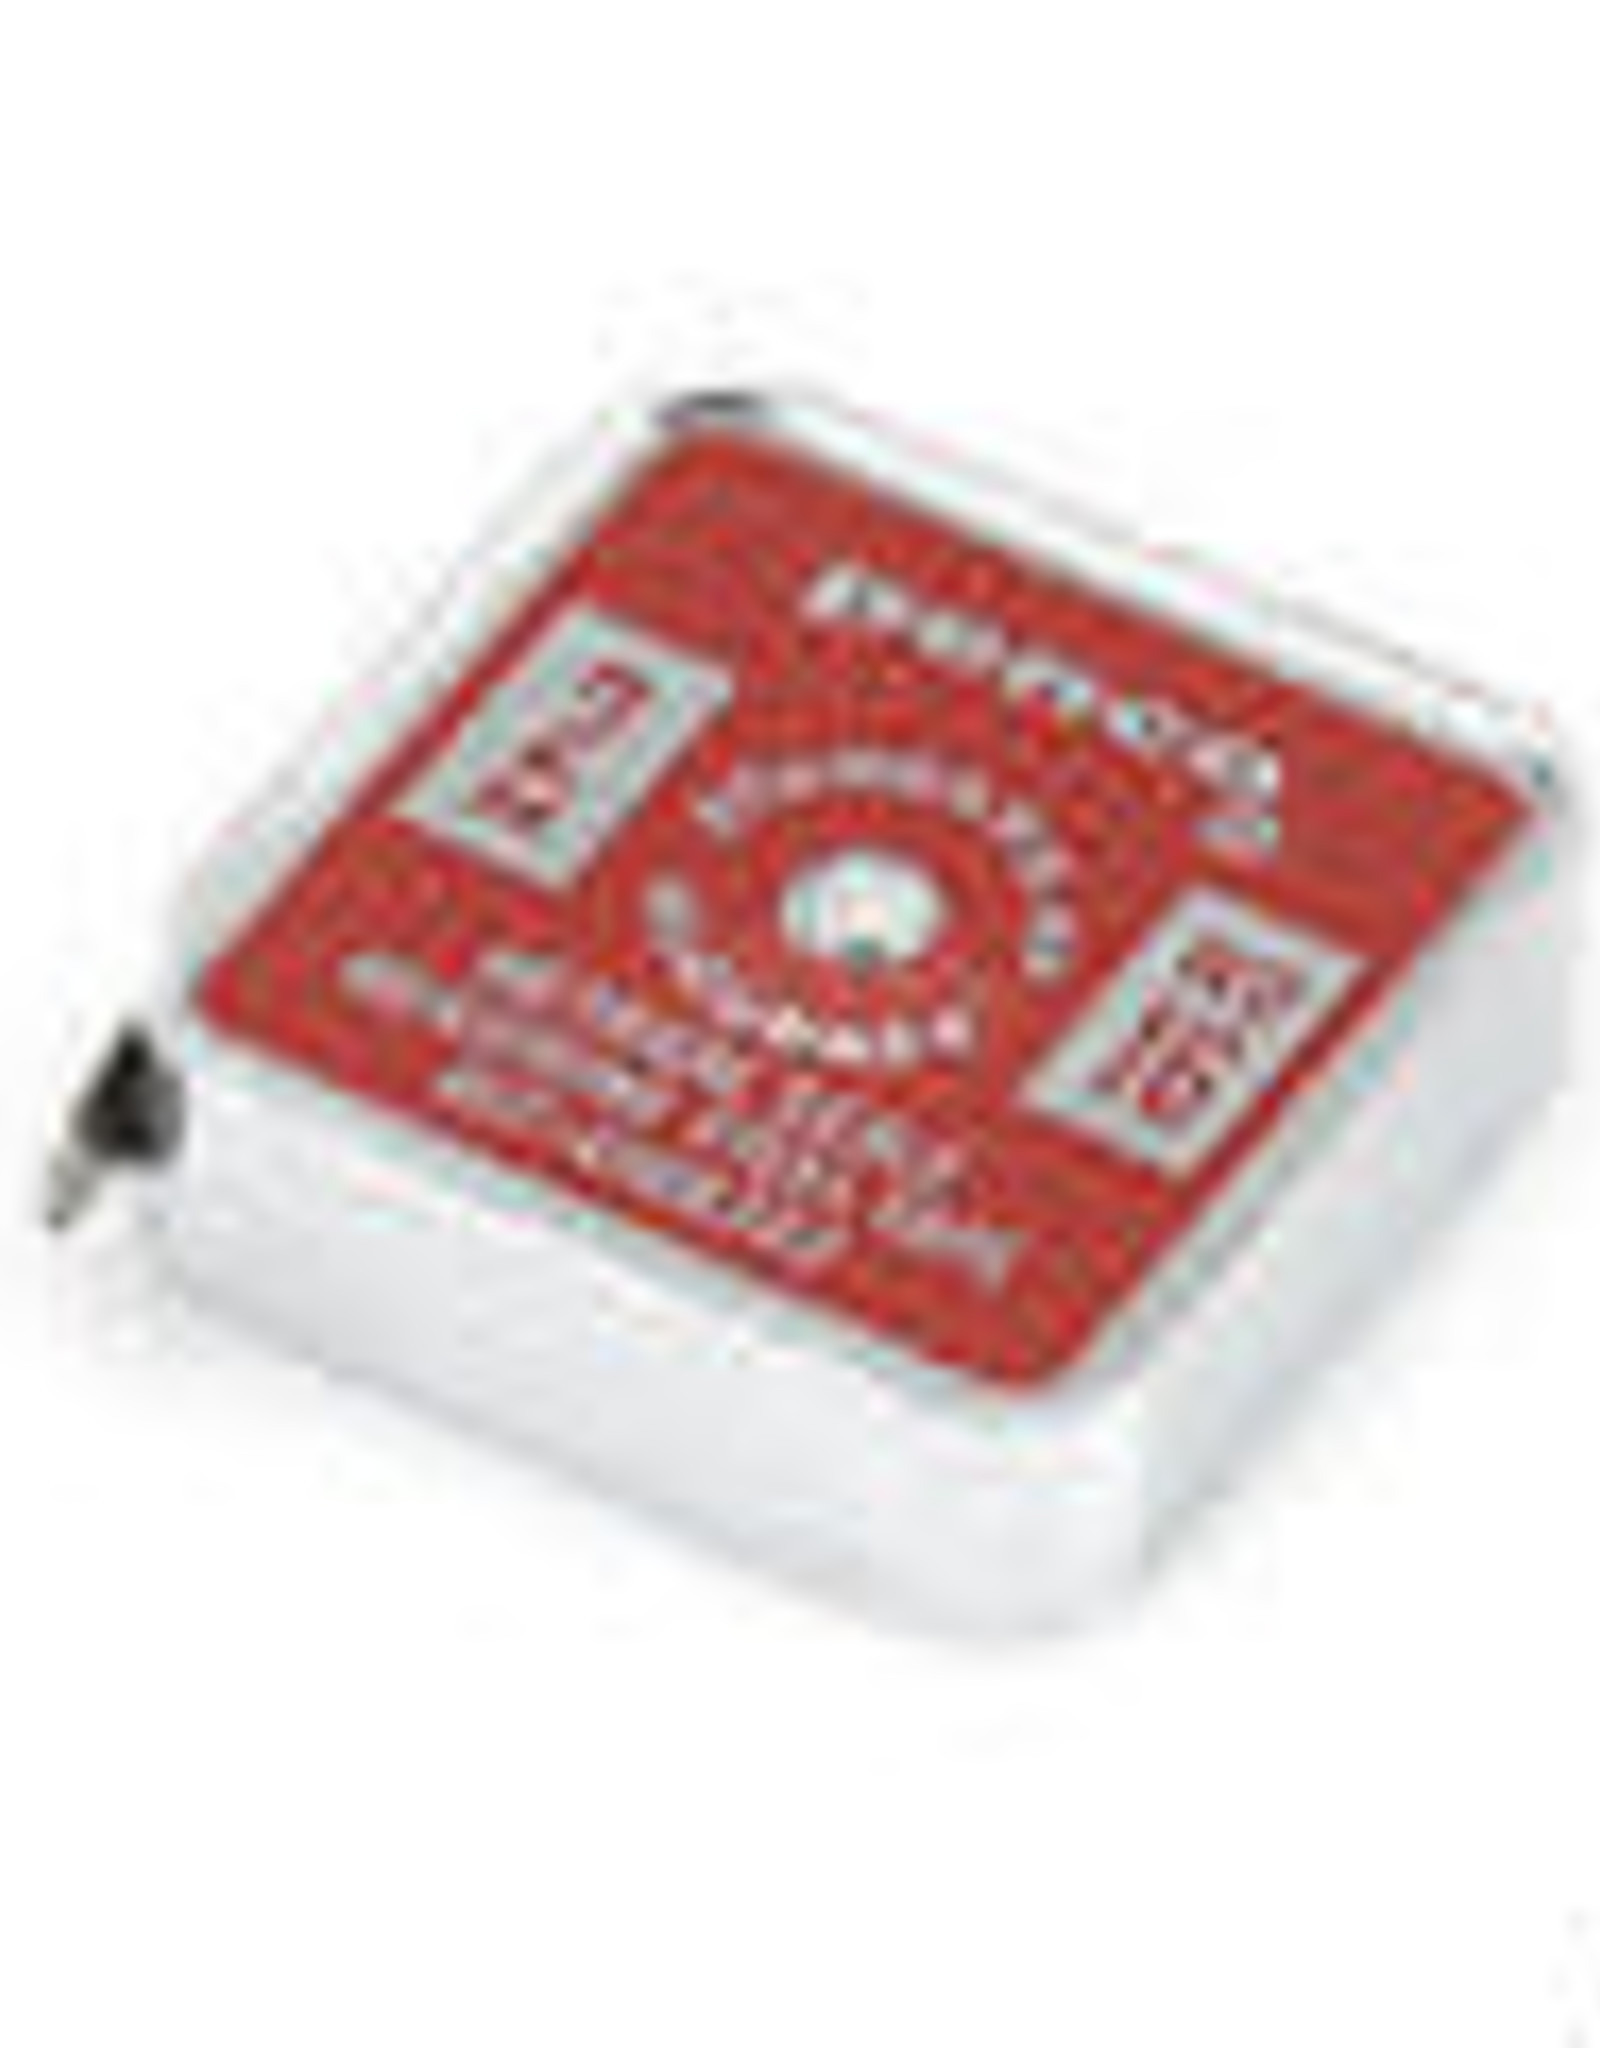 Hightide Hightide Pocket Tape Measure